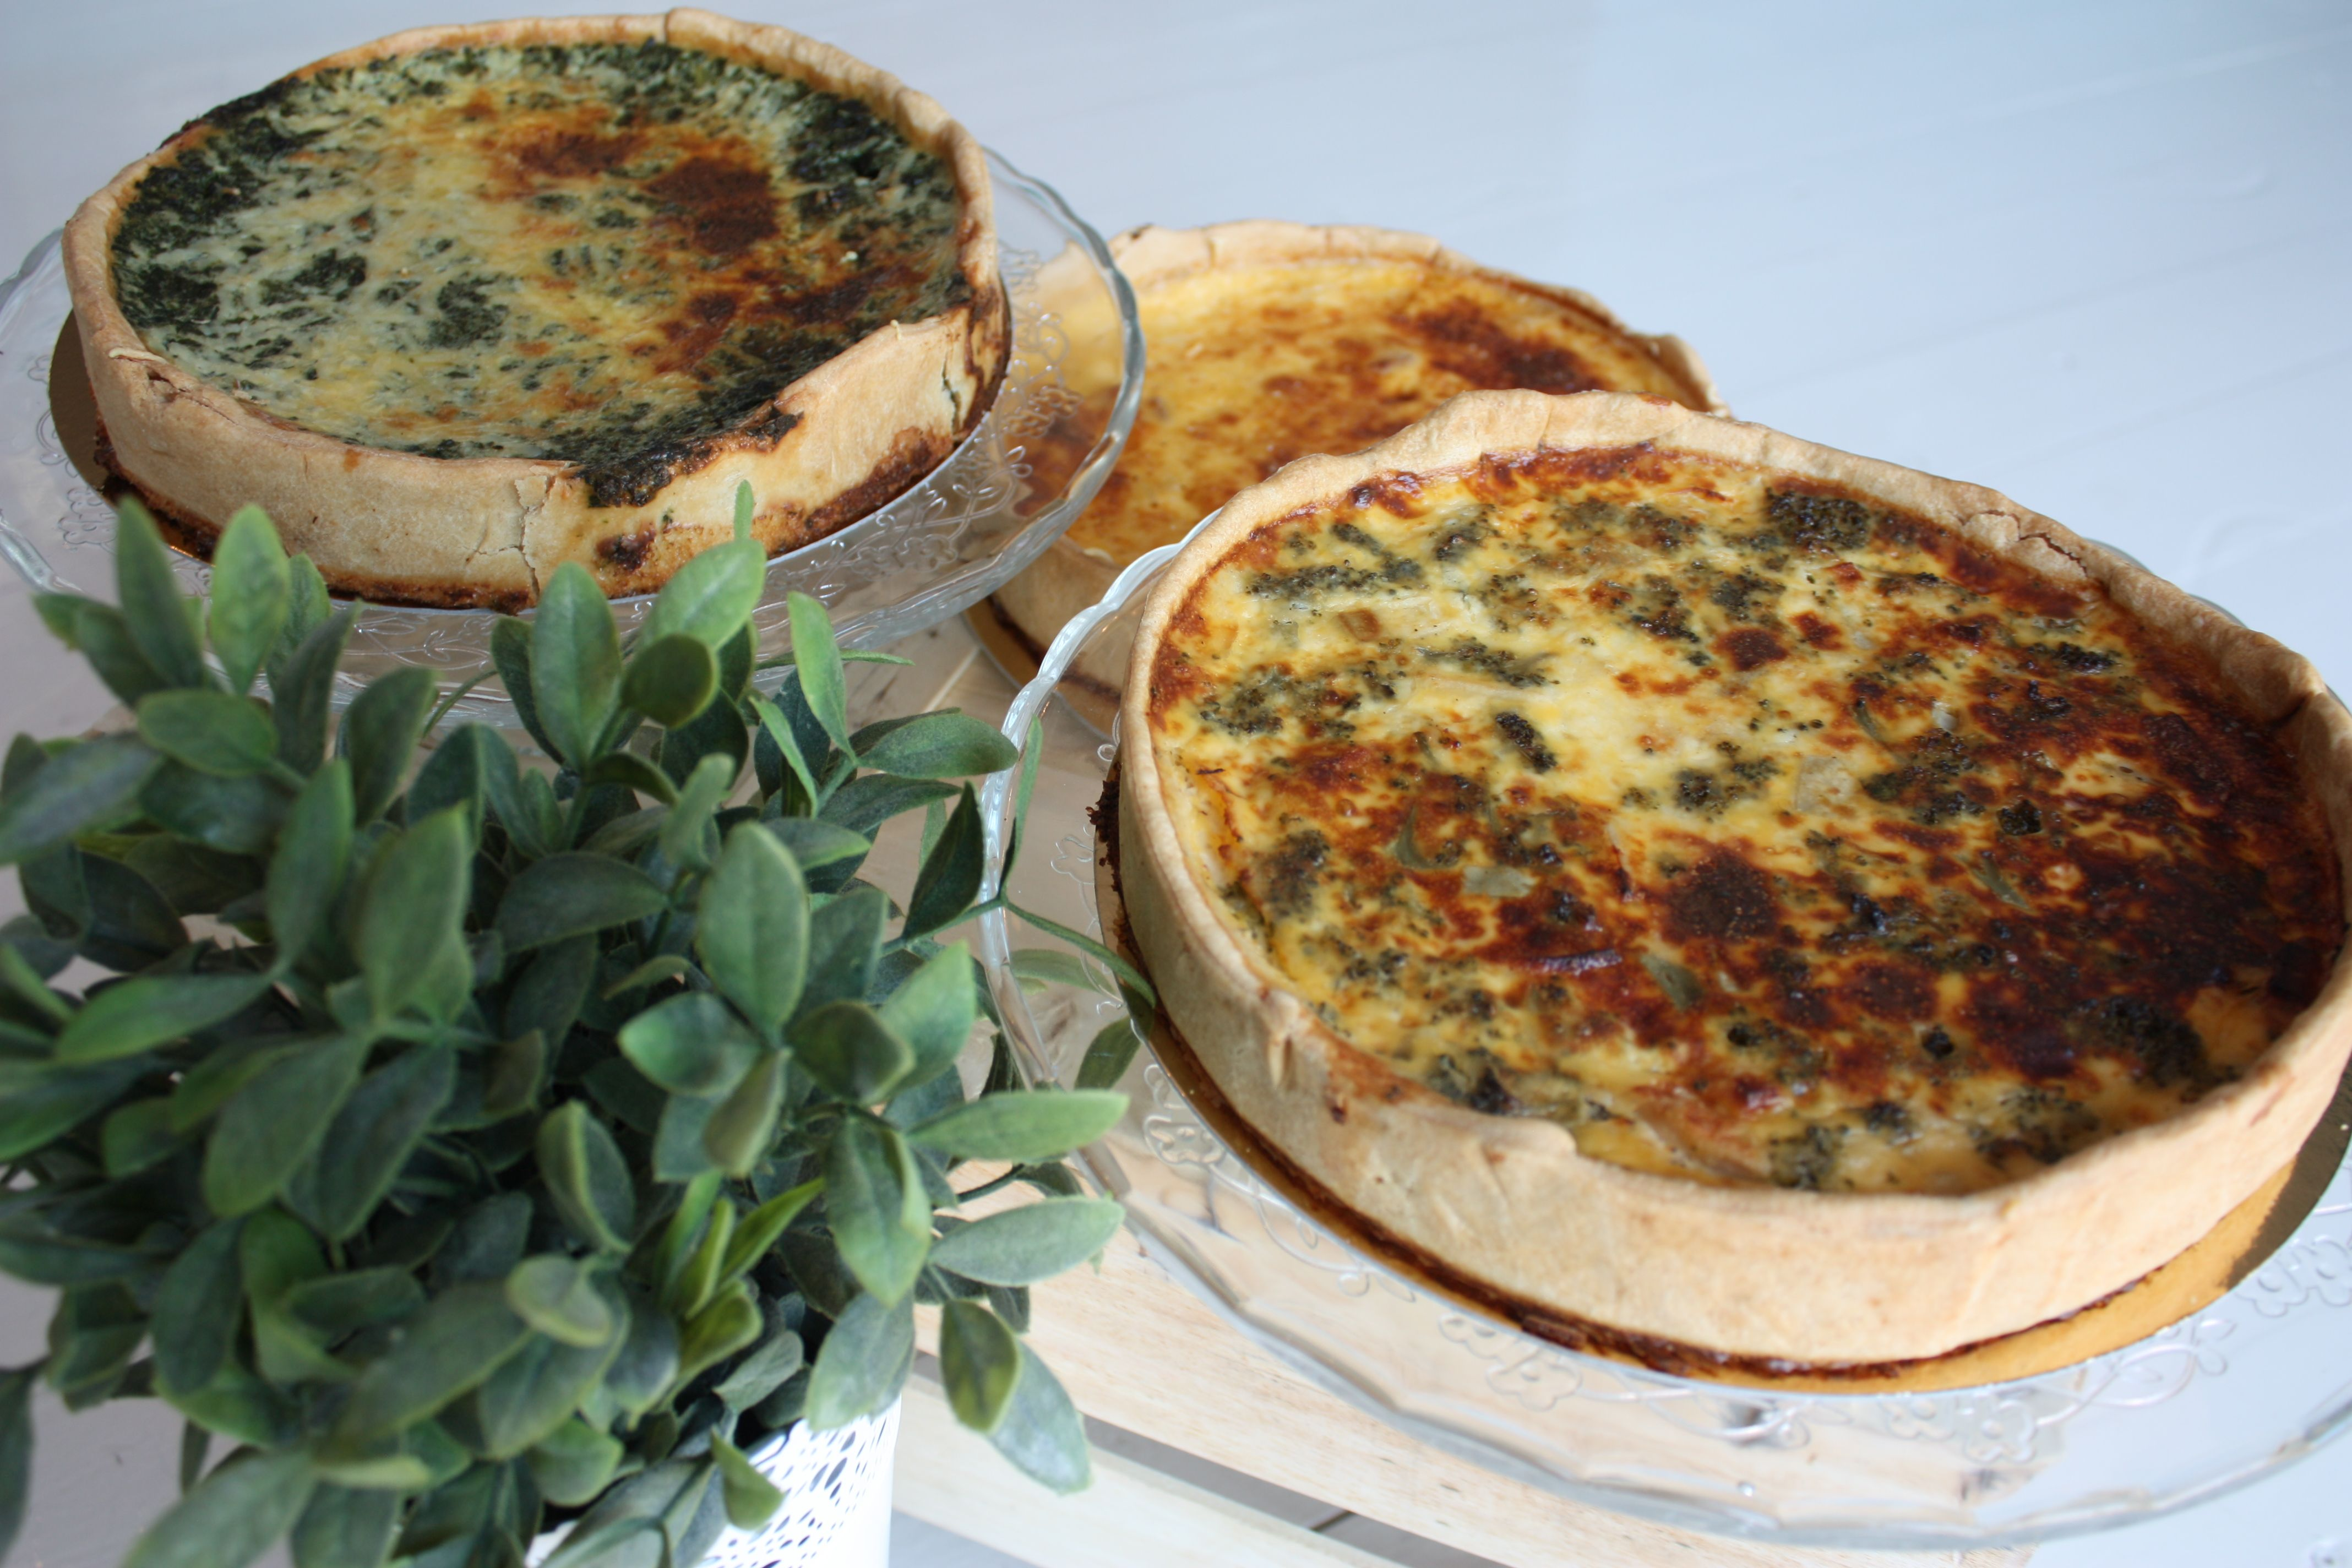 Quiches lorraine, quiche espinacas, quiche brocoli con pavo, quiche de champiñones, hechas masa y productos frescos sin conservantes.